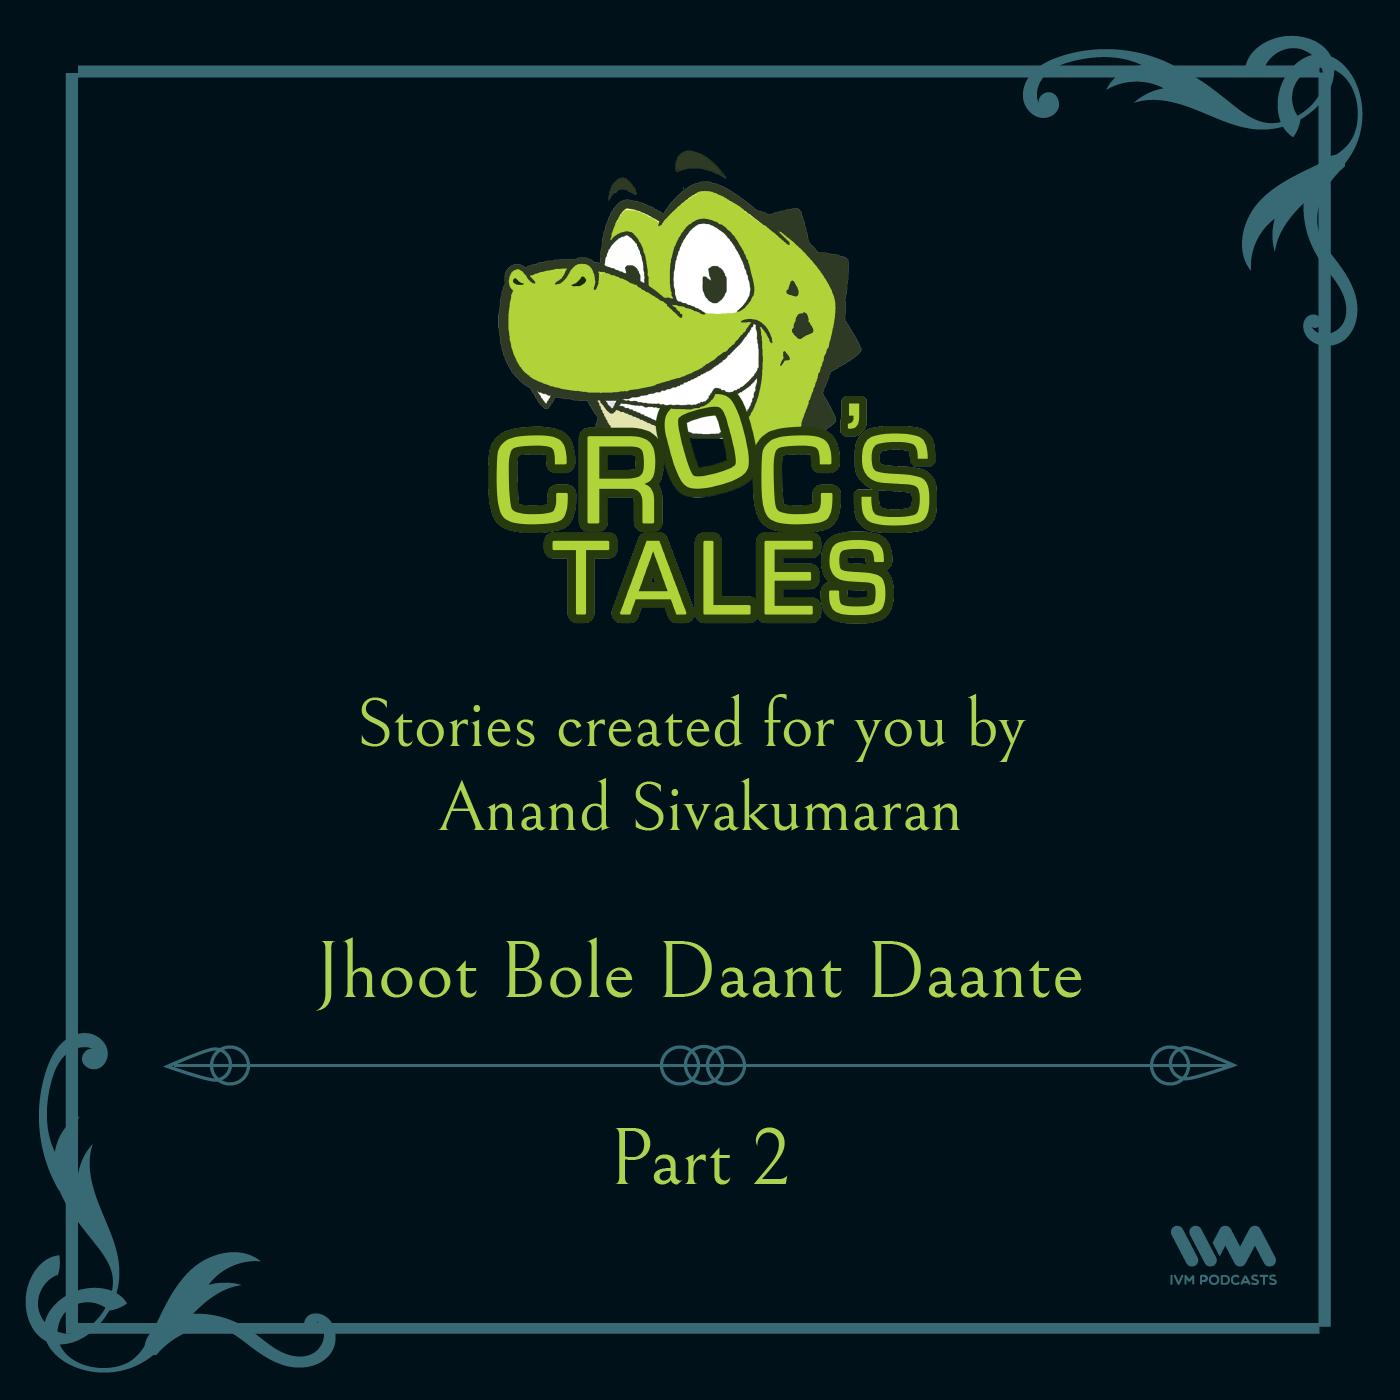 Ep. 87: Jhoot Bole Daant Daante (Part 2)